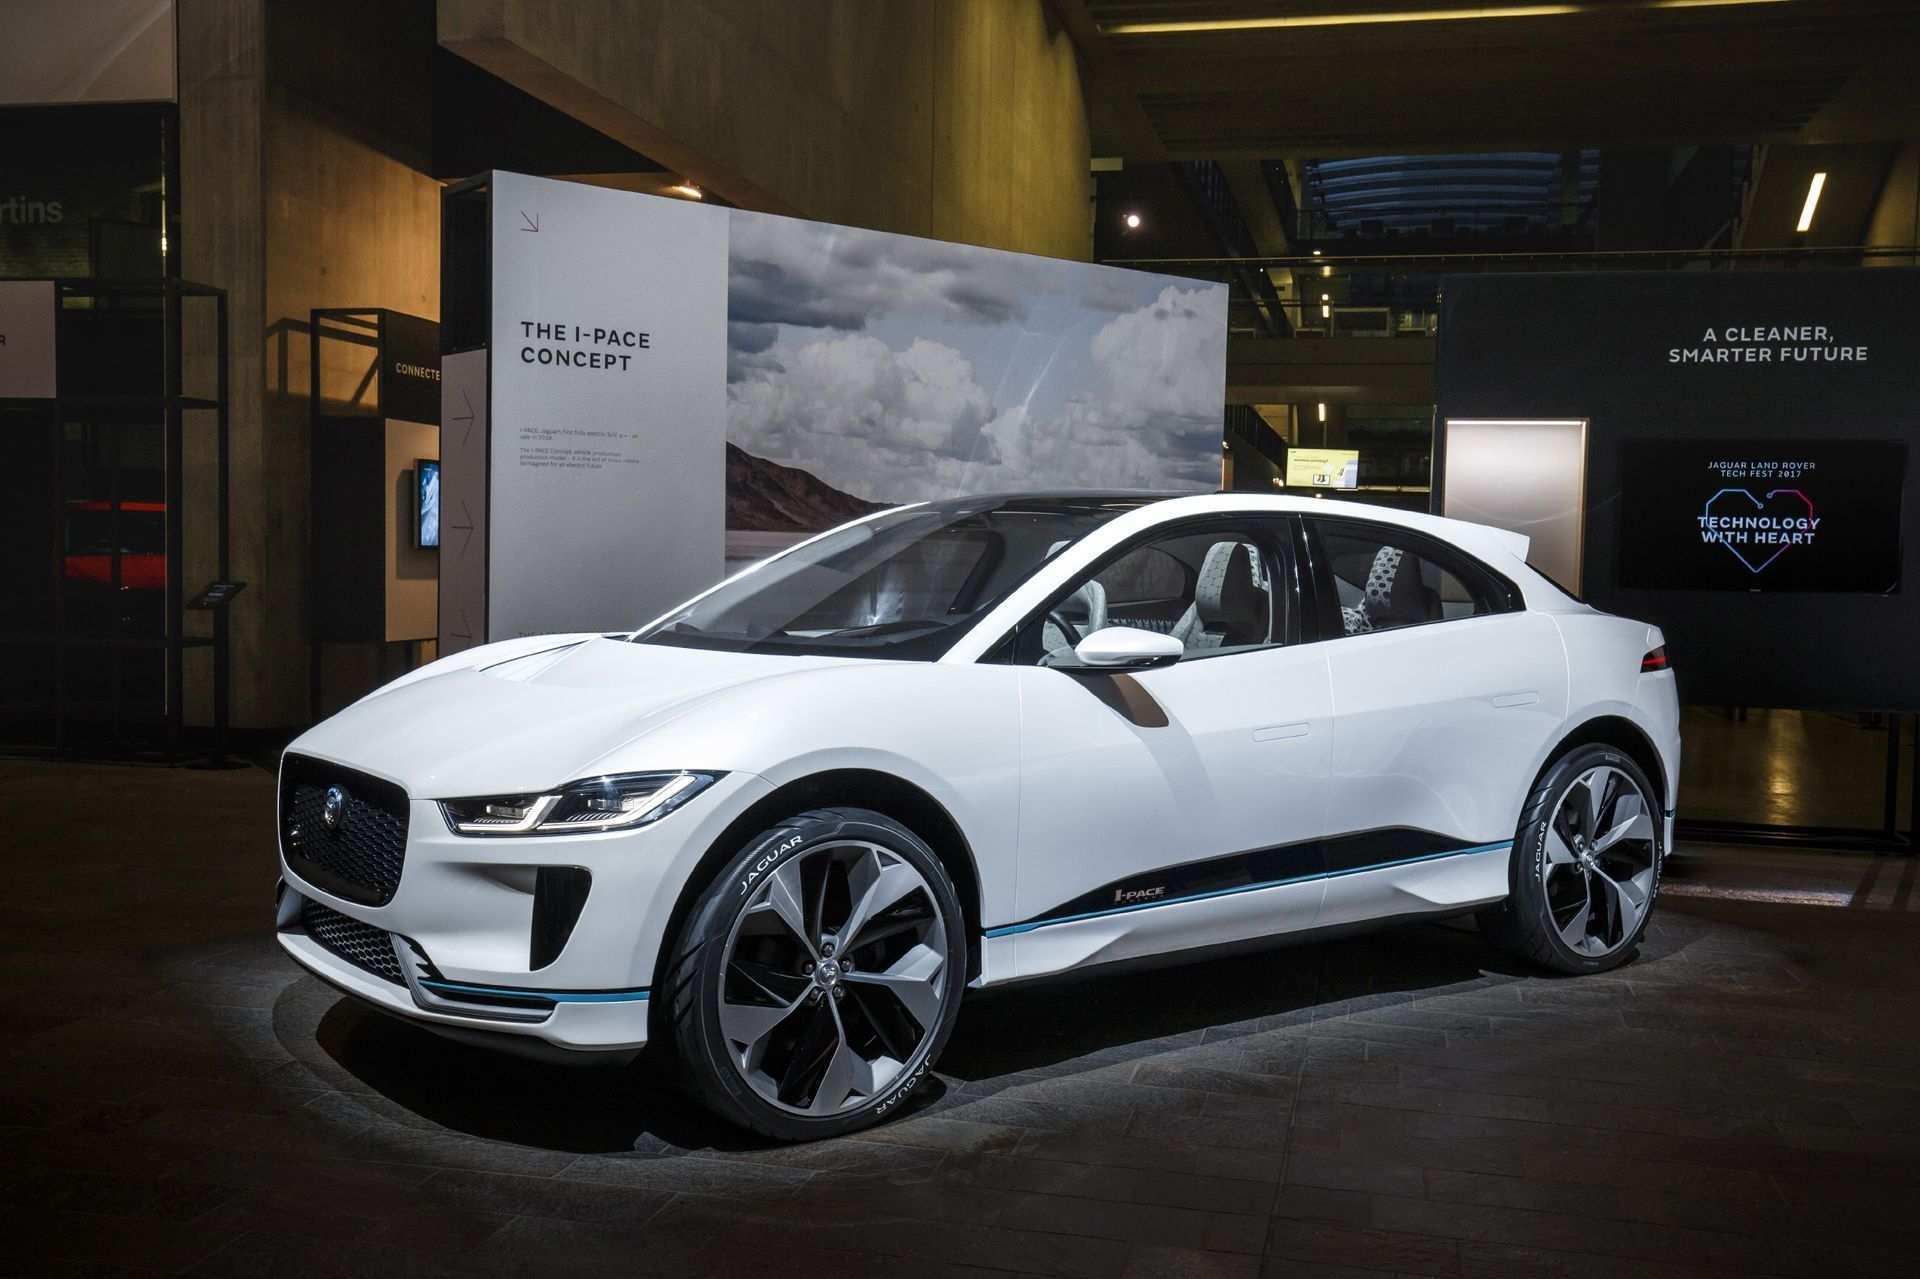 36 Best Review 2020 Jaguar I Pace Interior for 2020 Jaguar I Pace